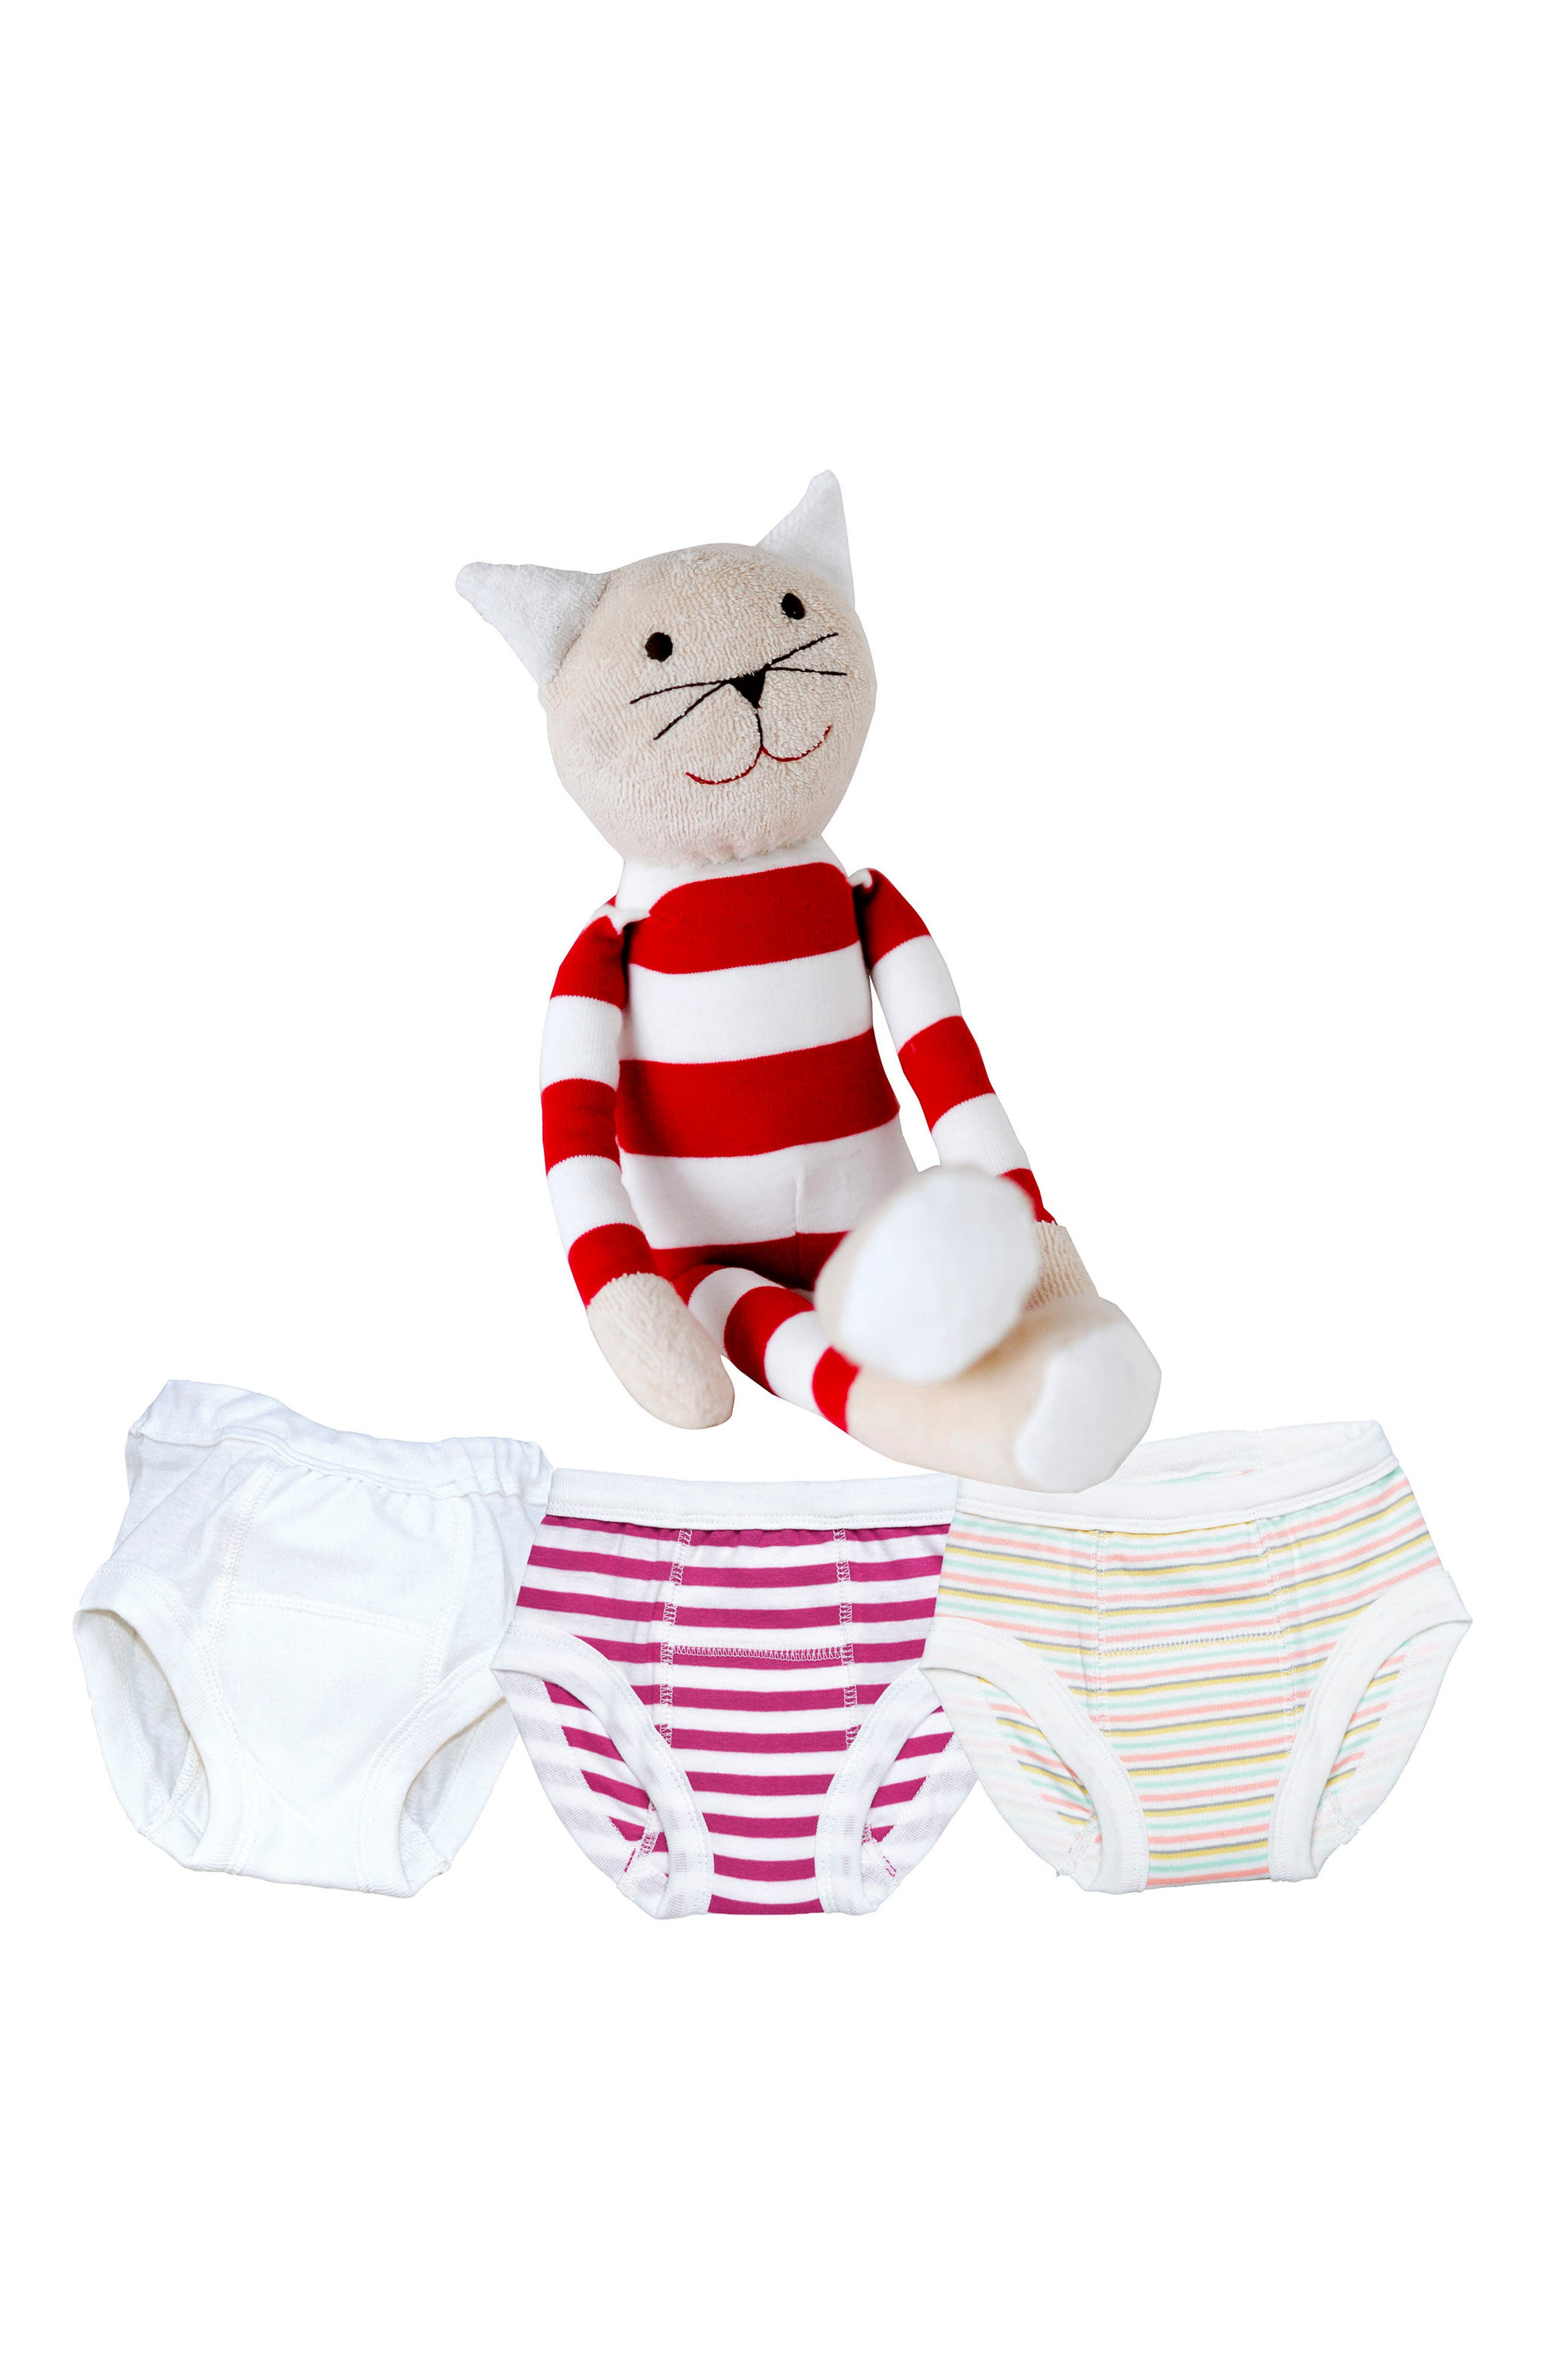 4-Piece Training Pants & Tilly Stuffed Animal Set,                         Main,                         color, PINK